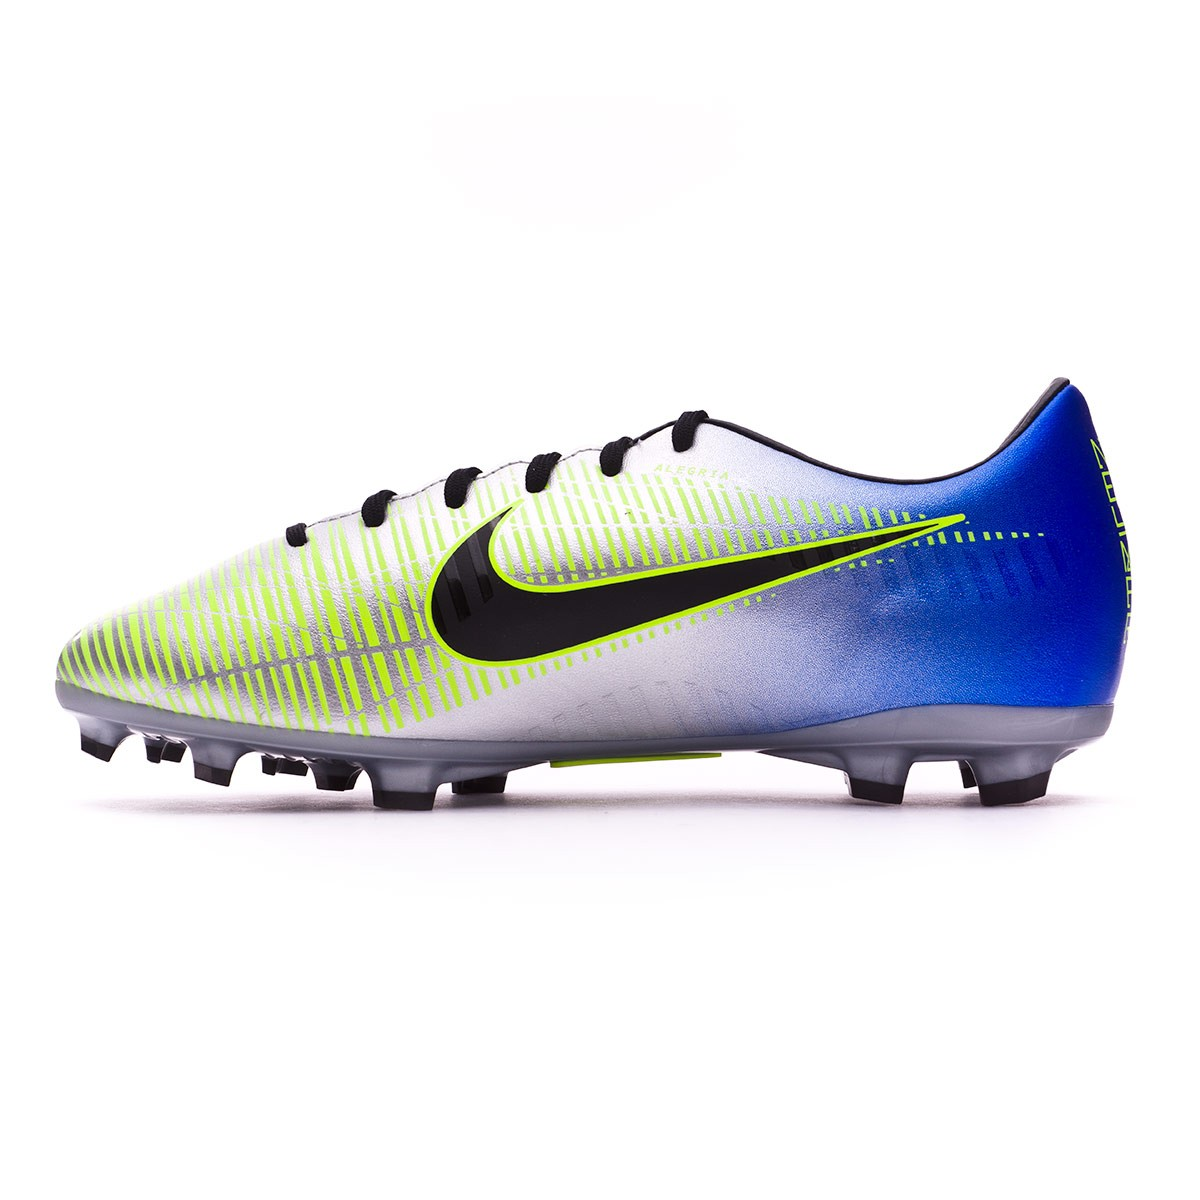 Bota de fútbol Nike Mercurial Victory VI FG Neymar Niño Racer  blue-Black-Chrome-Volt - Tienda de Fútbol. Soloporteros es ahora Fútbol  Emotion